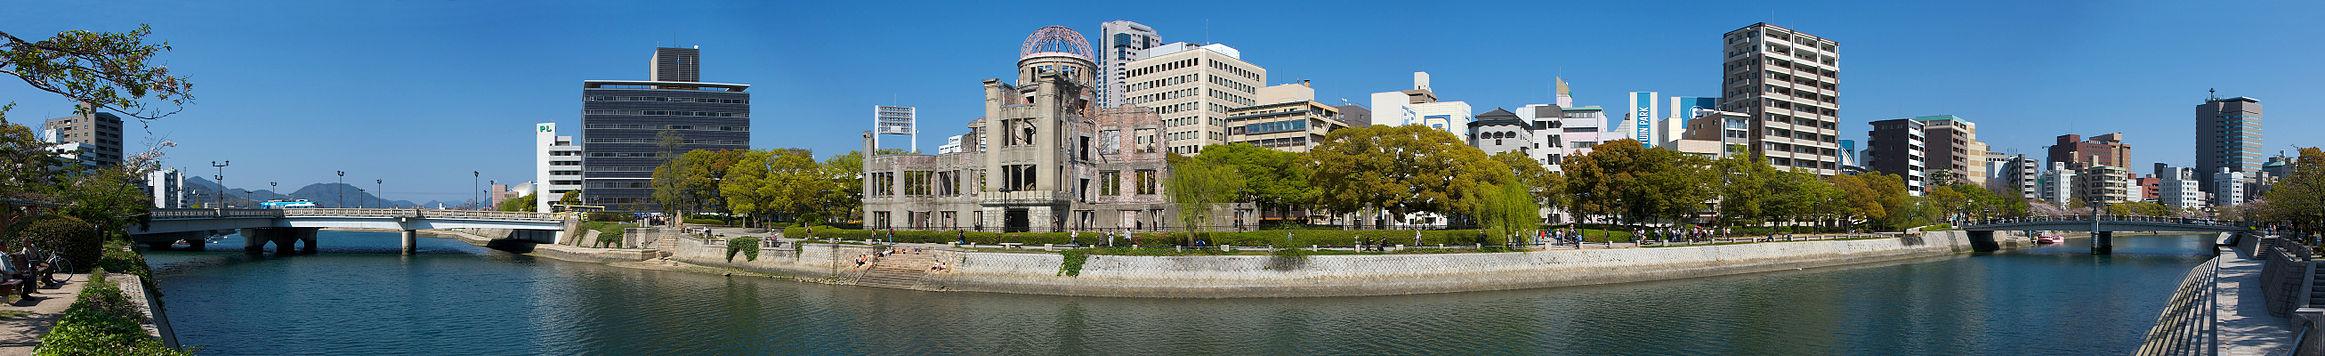 2325px-HiroshimaPeaceMemorialPanorama-2.jpg